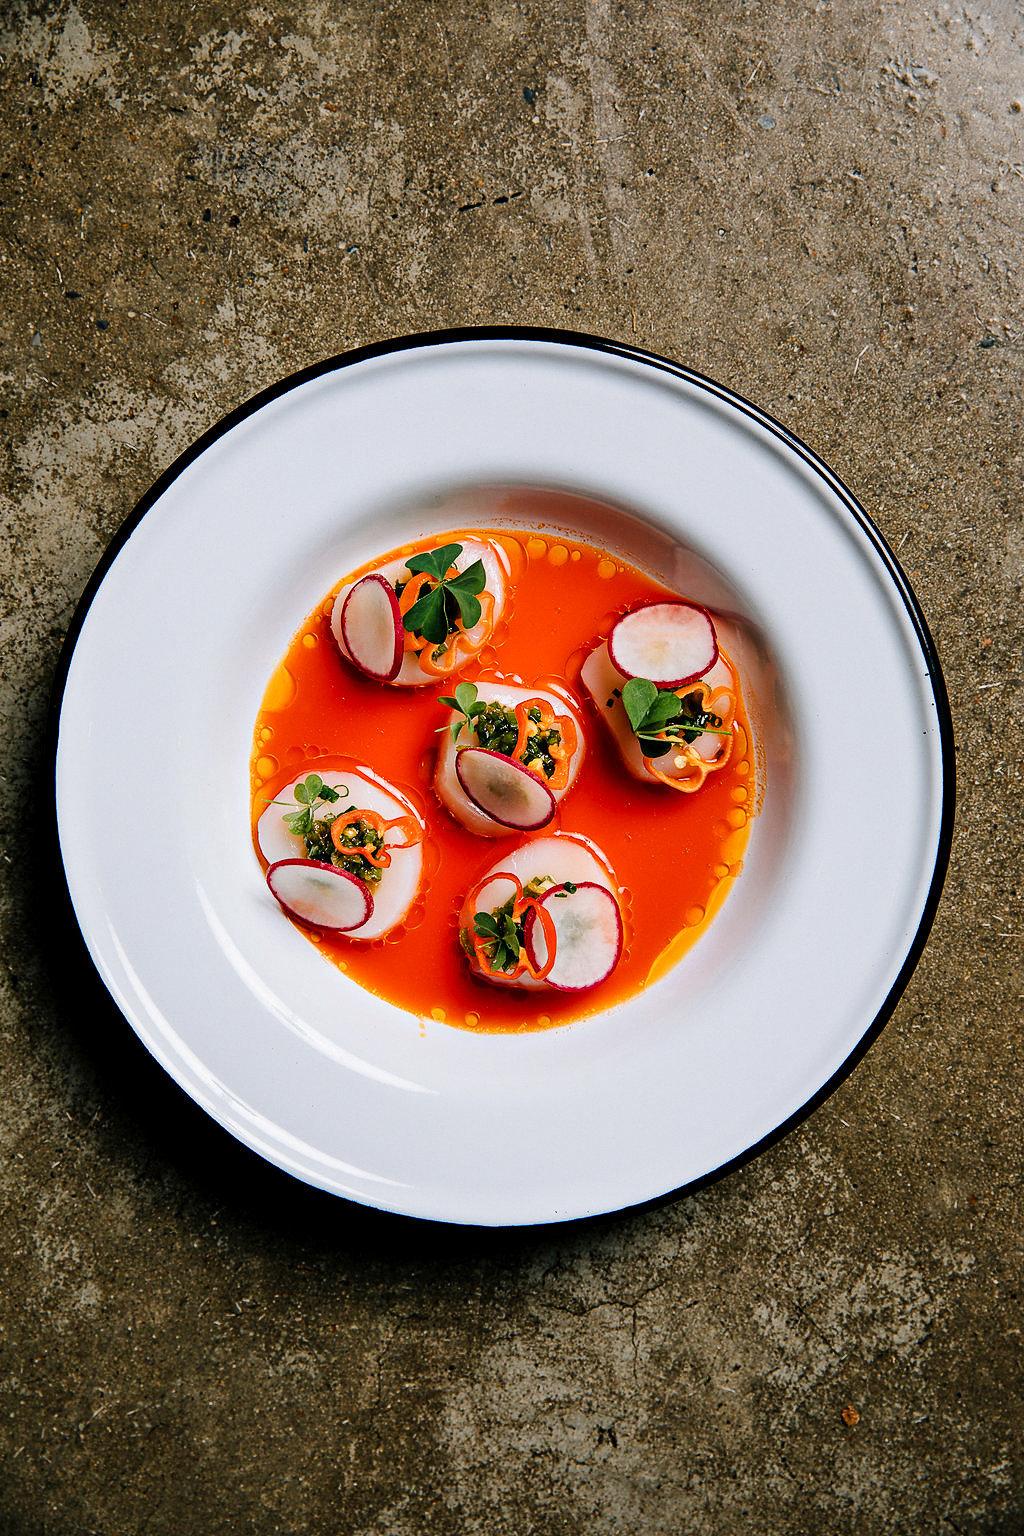 Food + Drink Trip Ideas plate food dish dishware tableware vegetable soup recipe platter cuisine meal